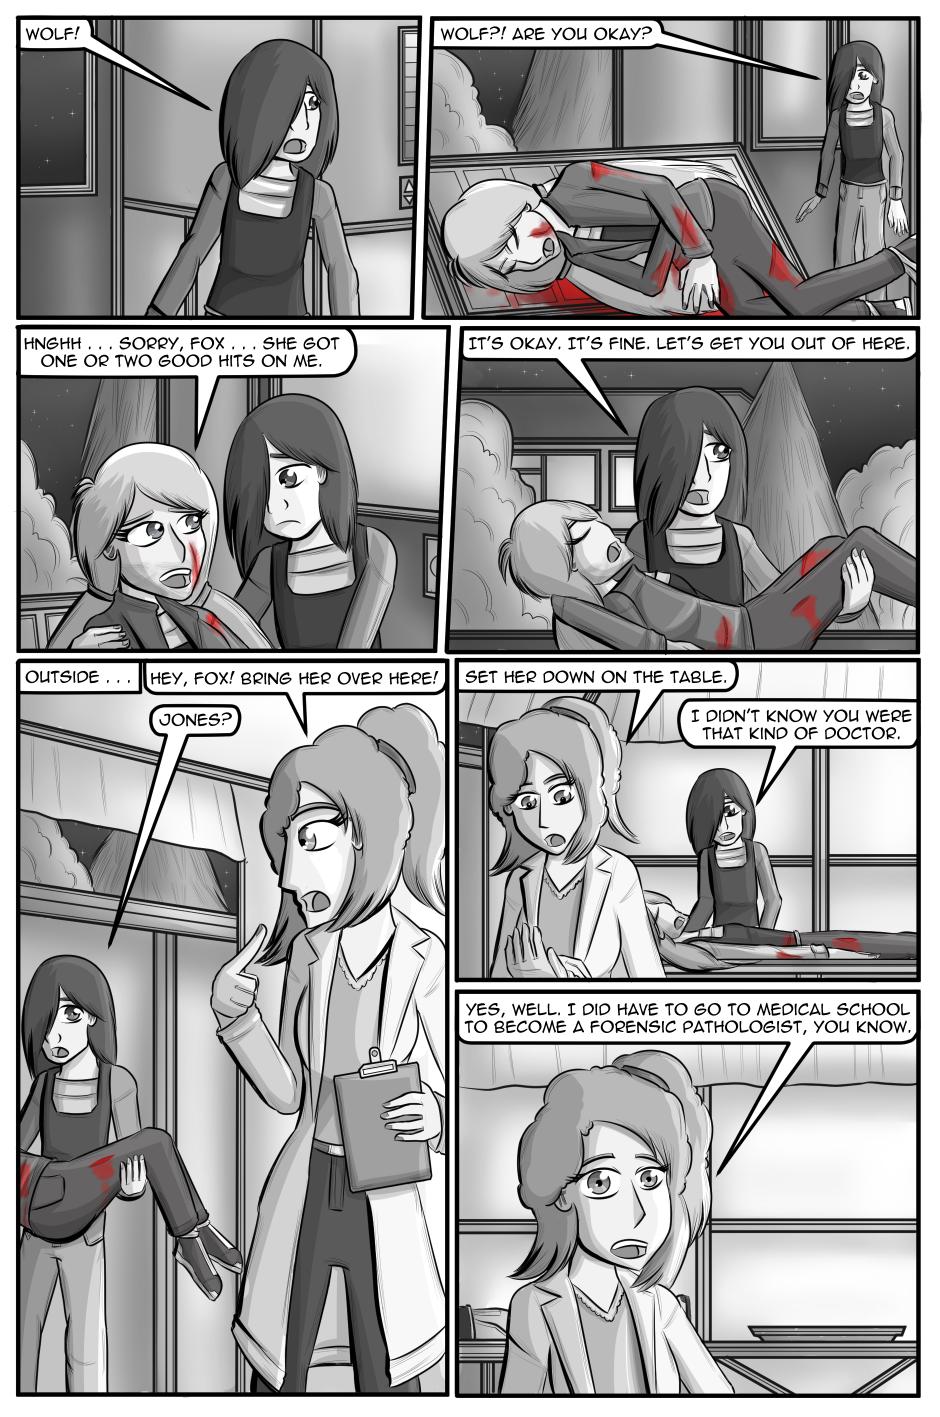 Loyal Hound - Part 79